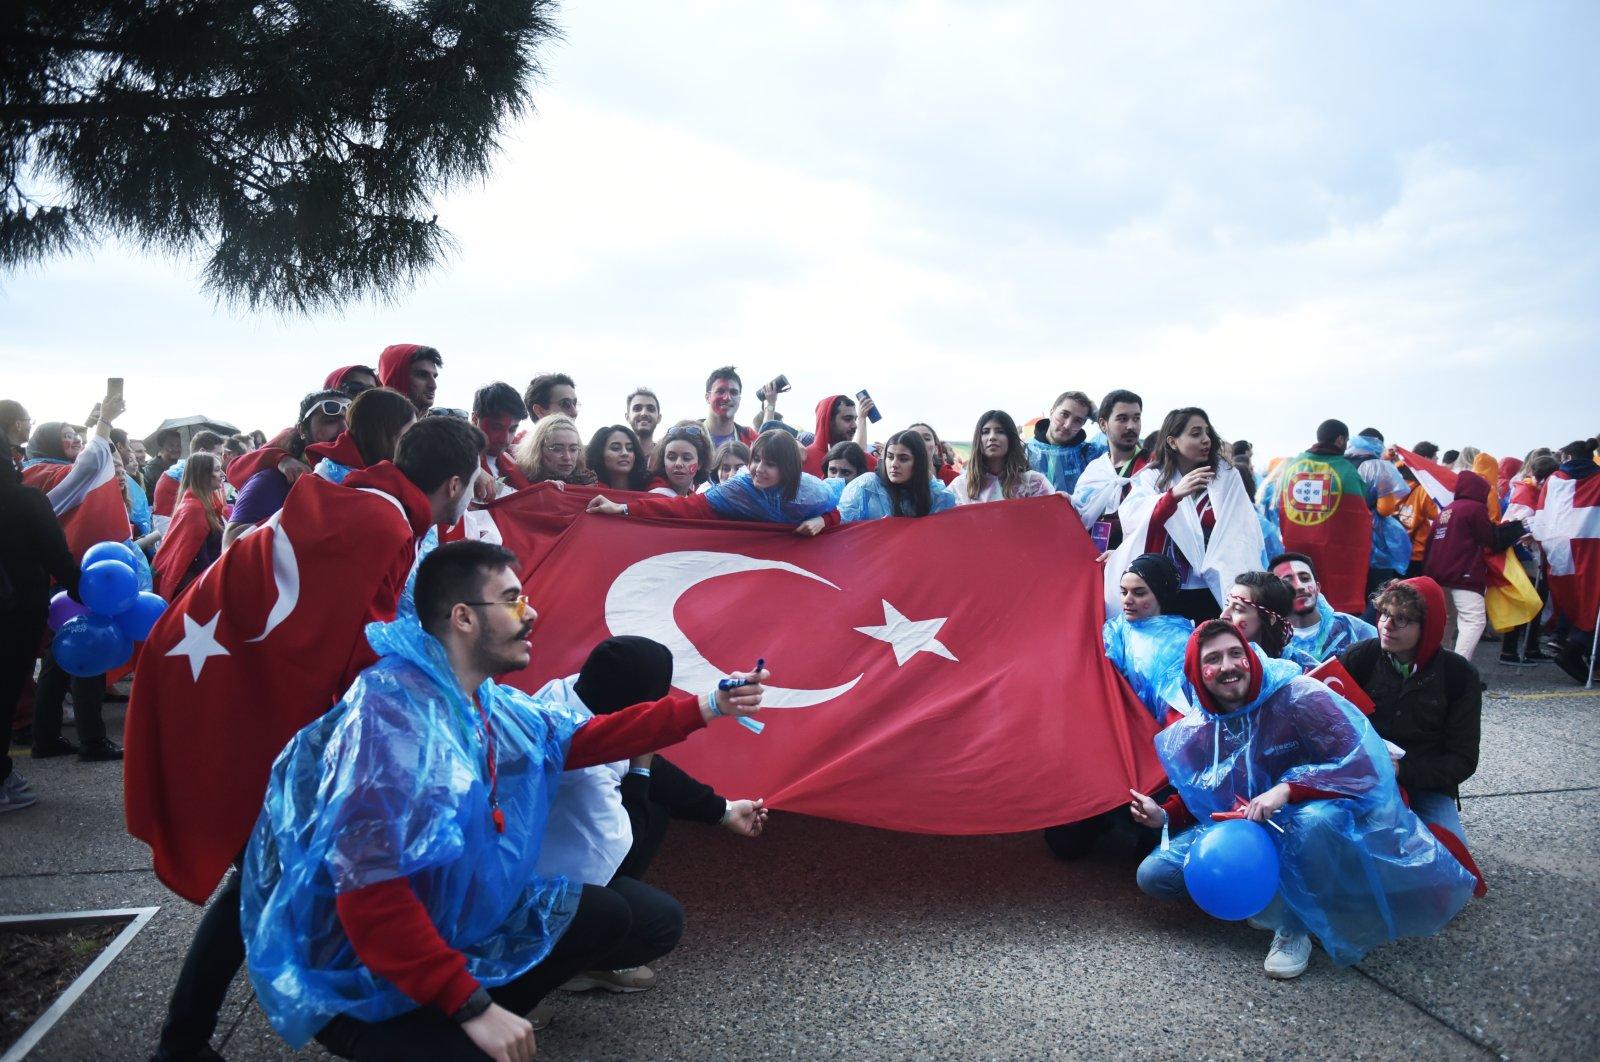 Turkish Erasmus students hold a Turkish flag during an annual Erasmus student meeting, in Thessaloniki, Greece, April 18, 2019. (Shutterstock Photo)